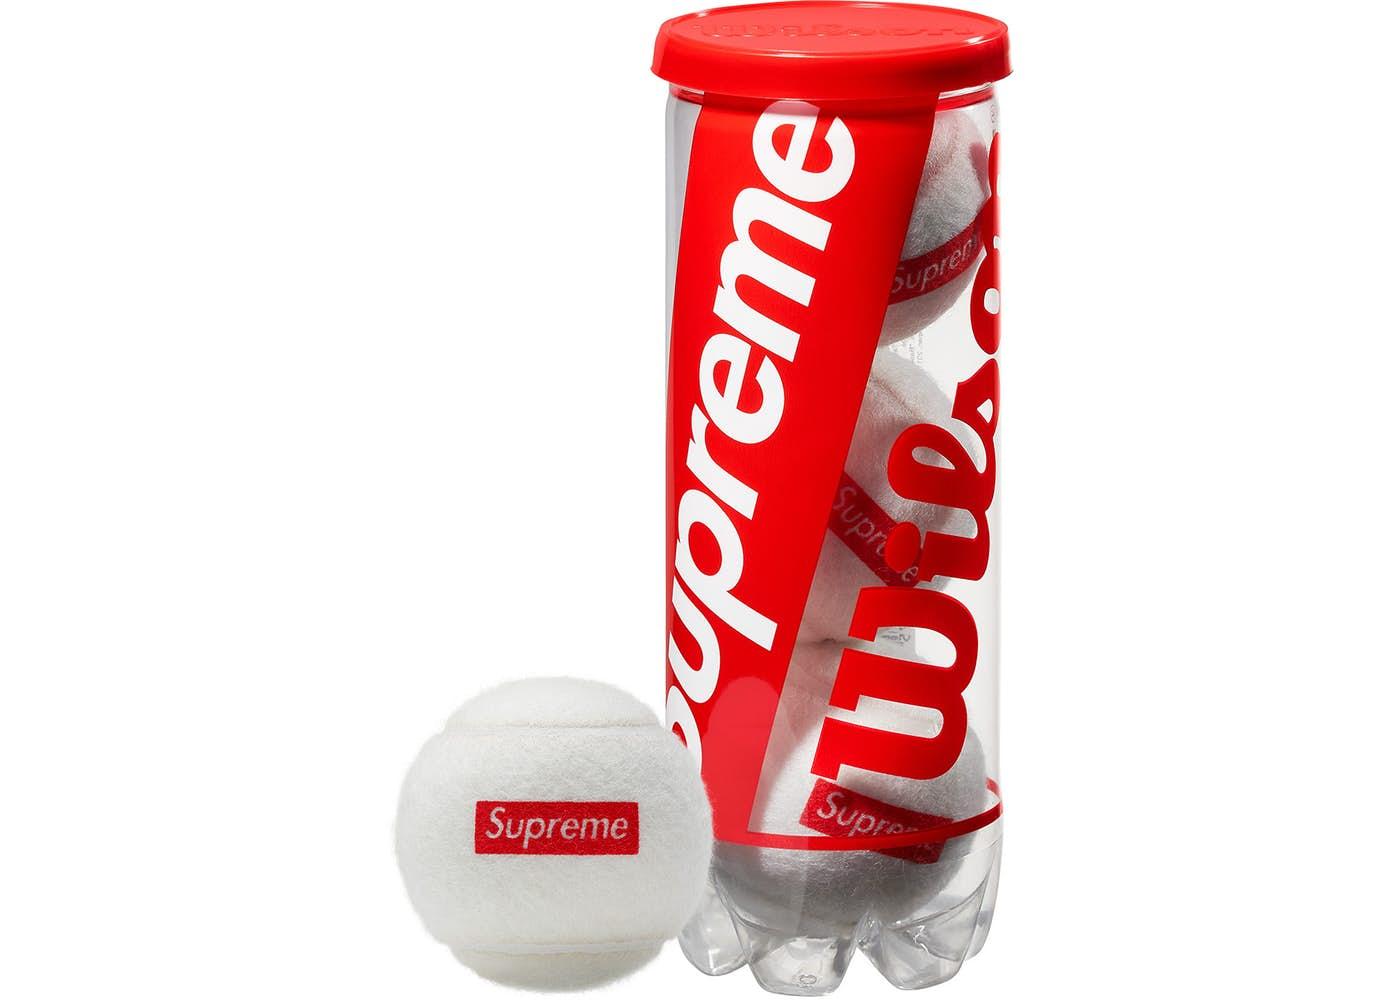 Supreme Wilson Tennis Balls - StockX News